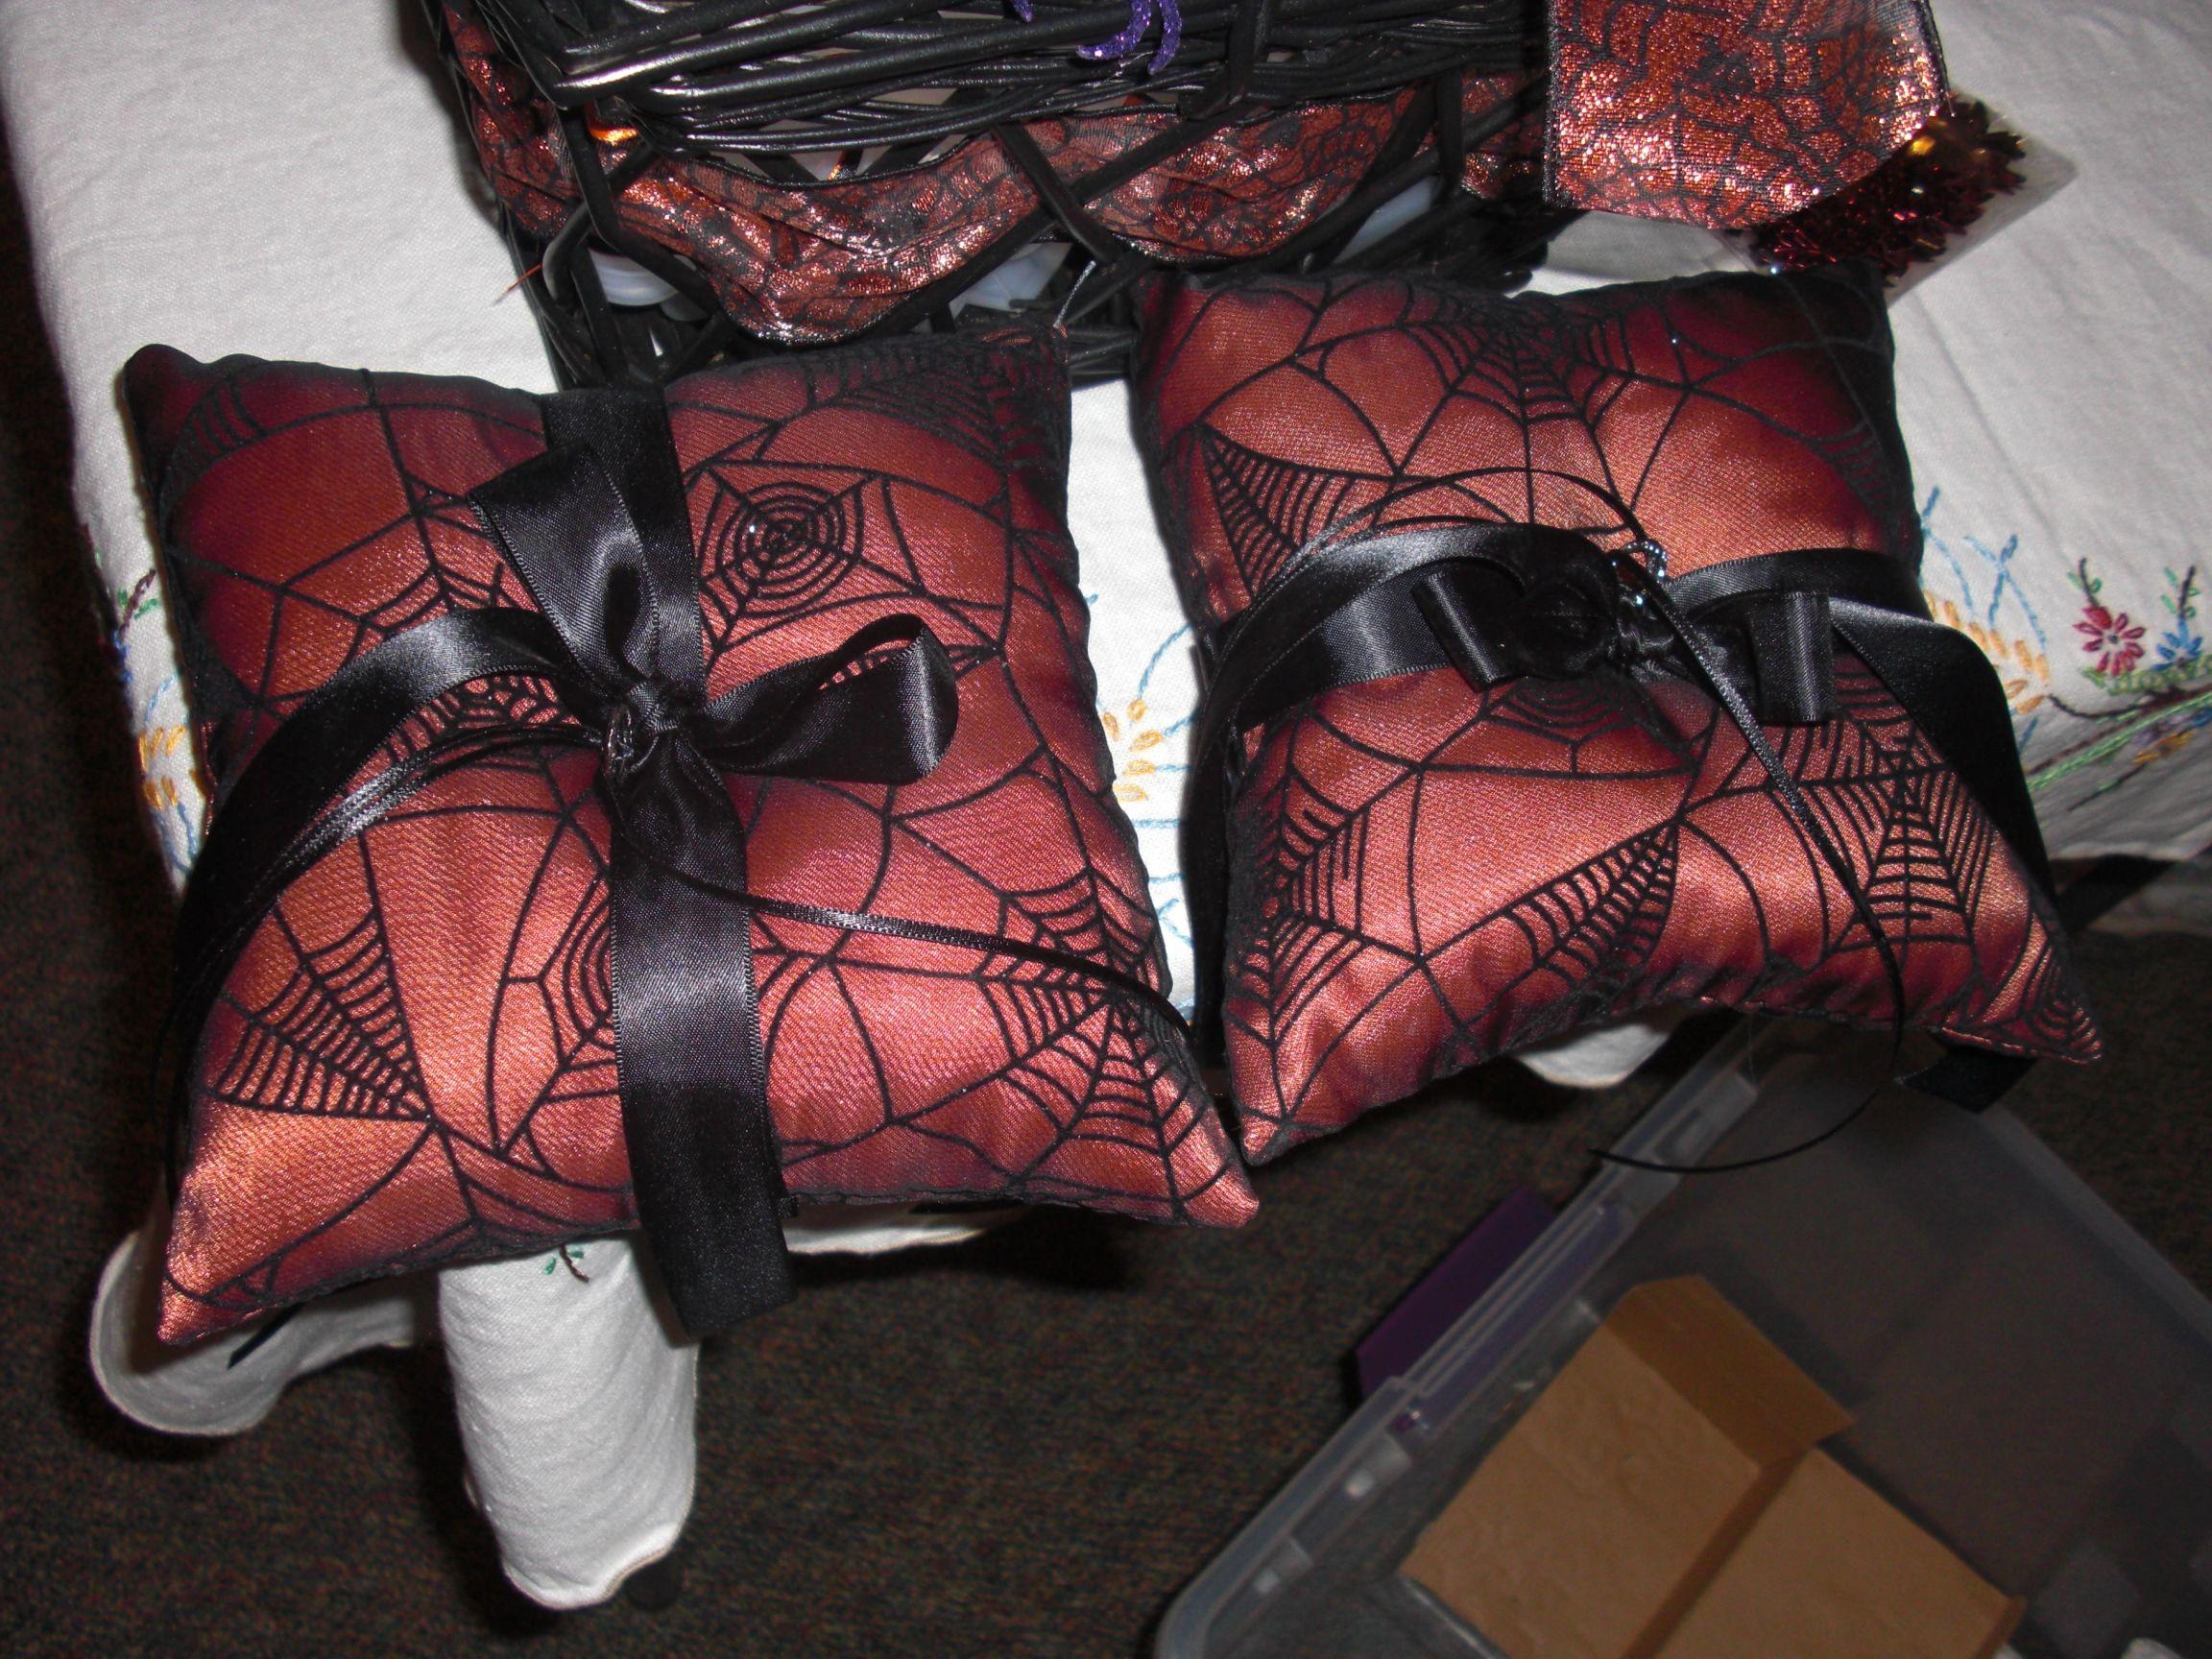 the little boys' pillows